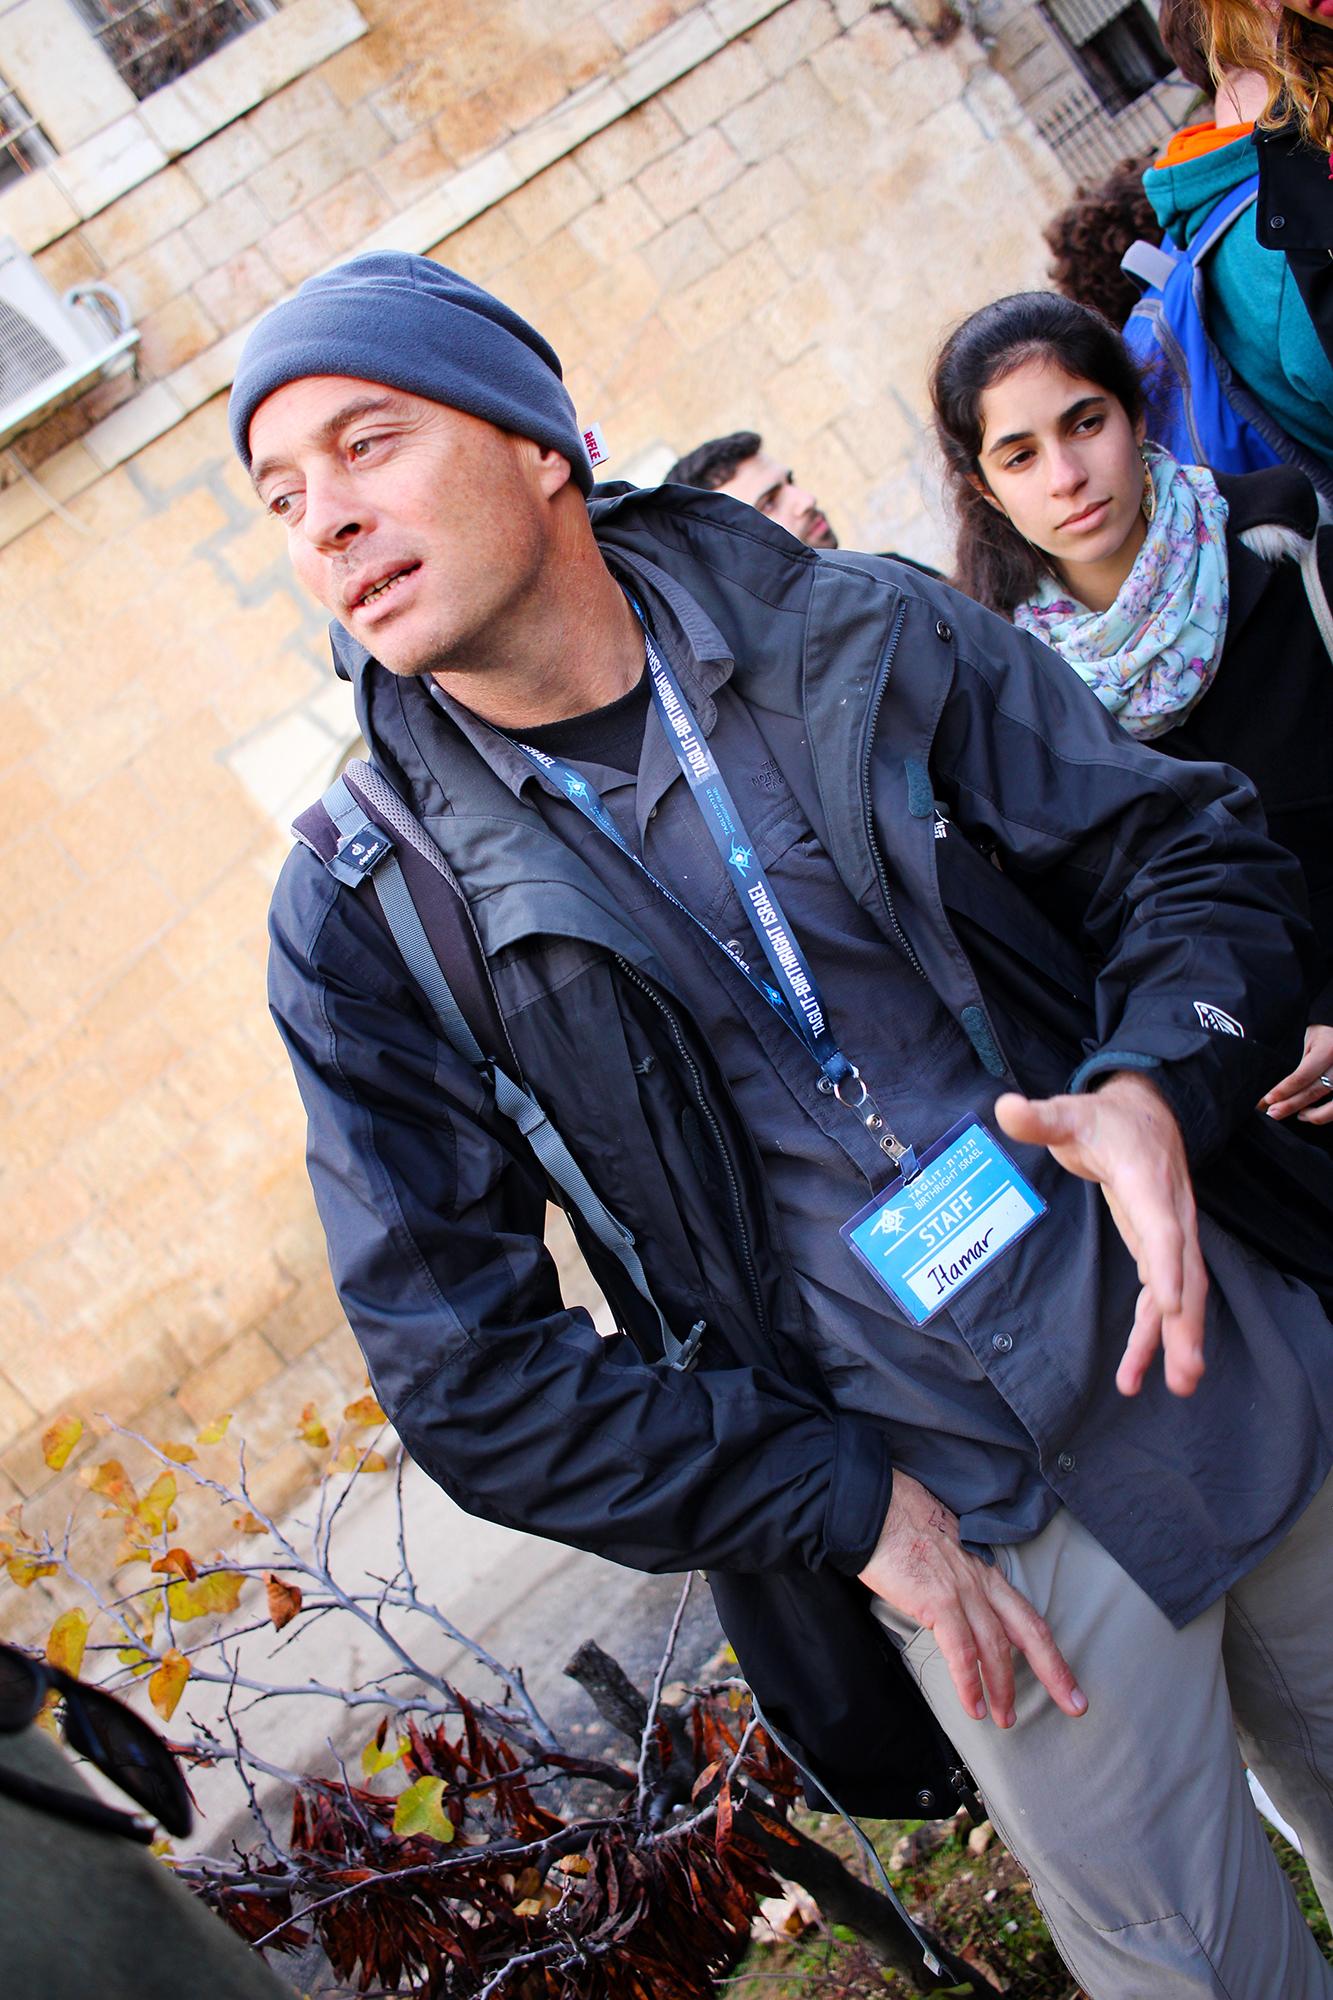 Yemin Moshe, Old Jerusalem, Israel. Travel photography by Geena Matuson @geenamatuson #thegirlmirage.